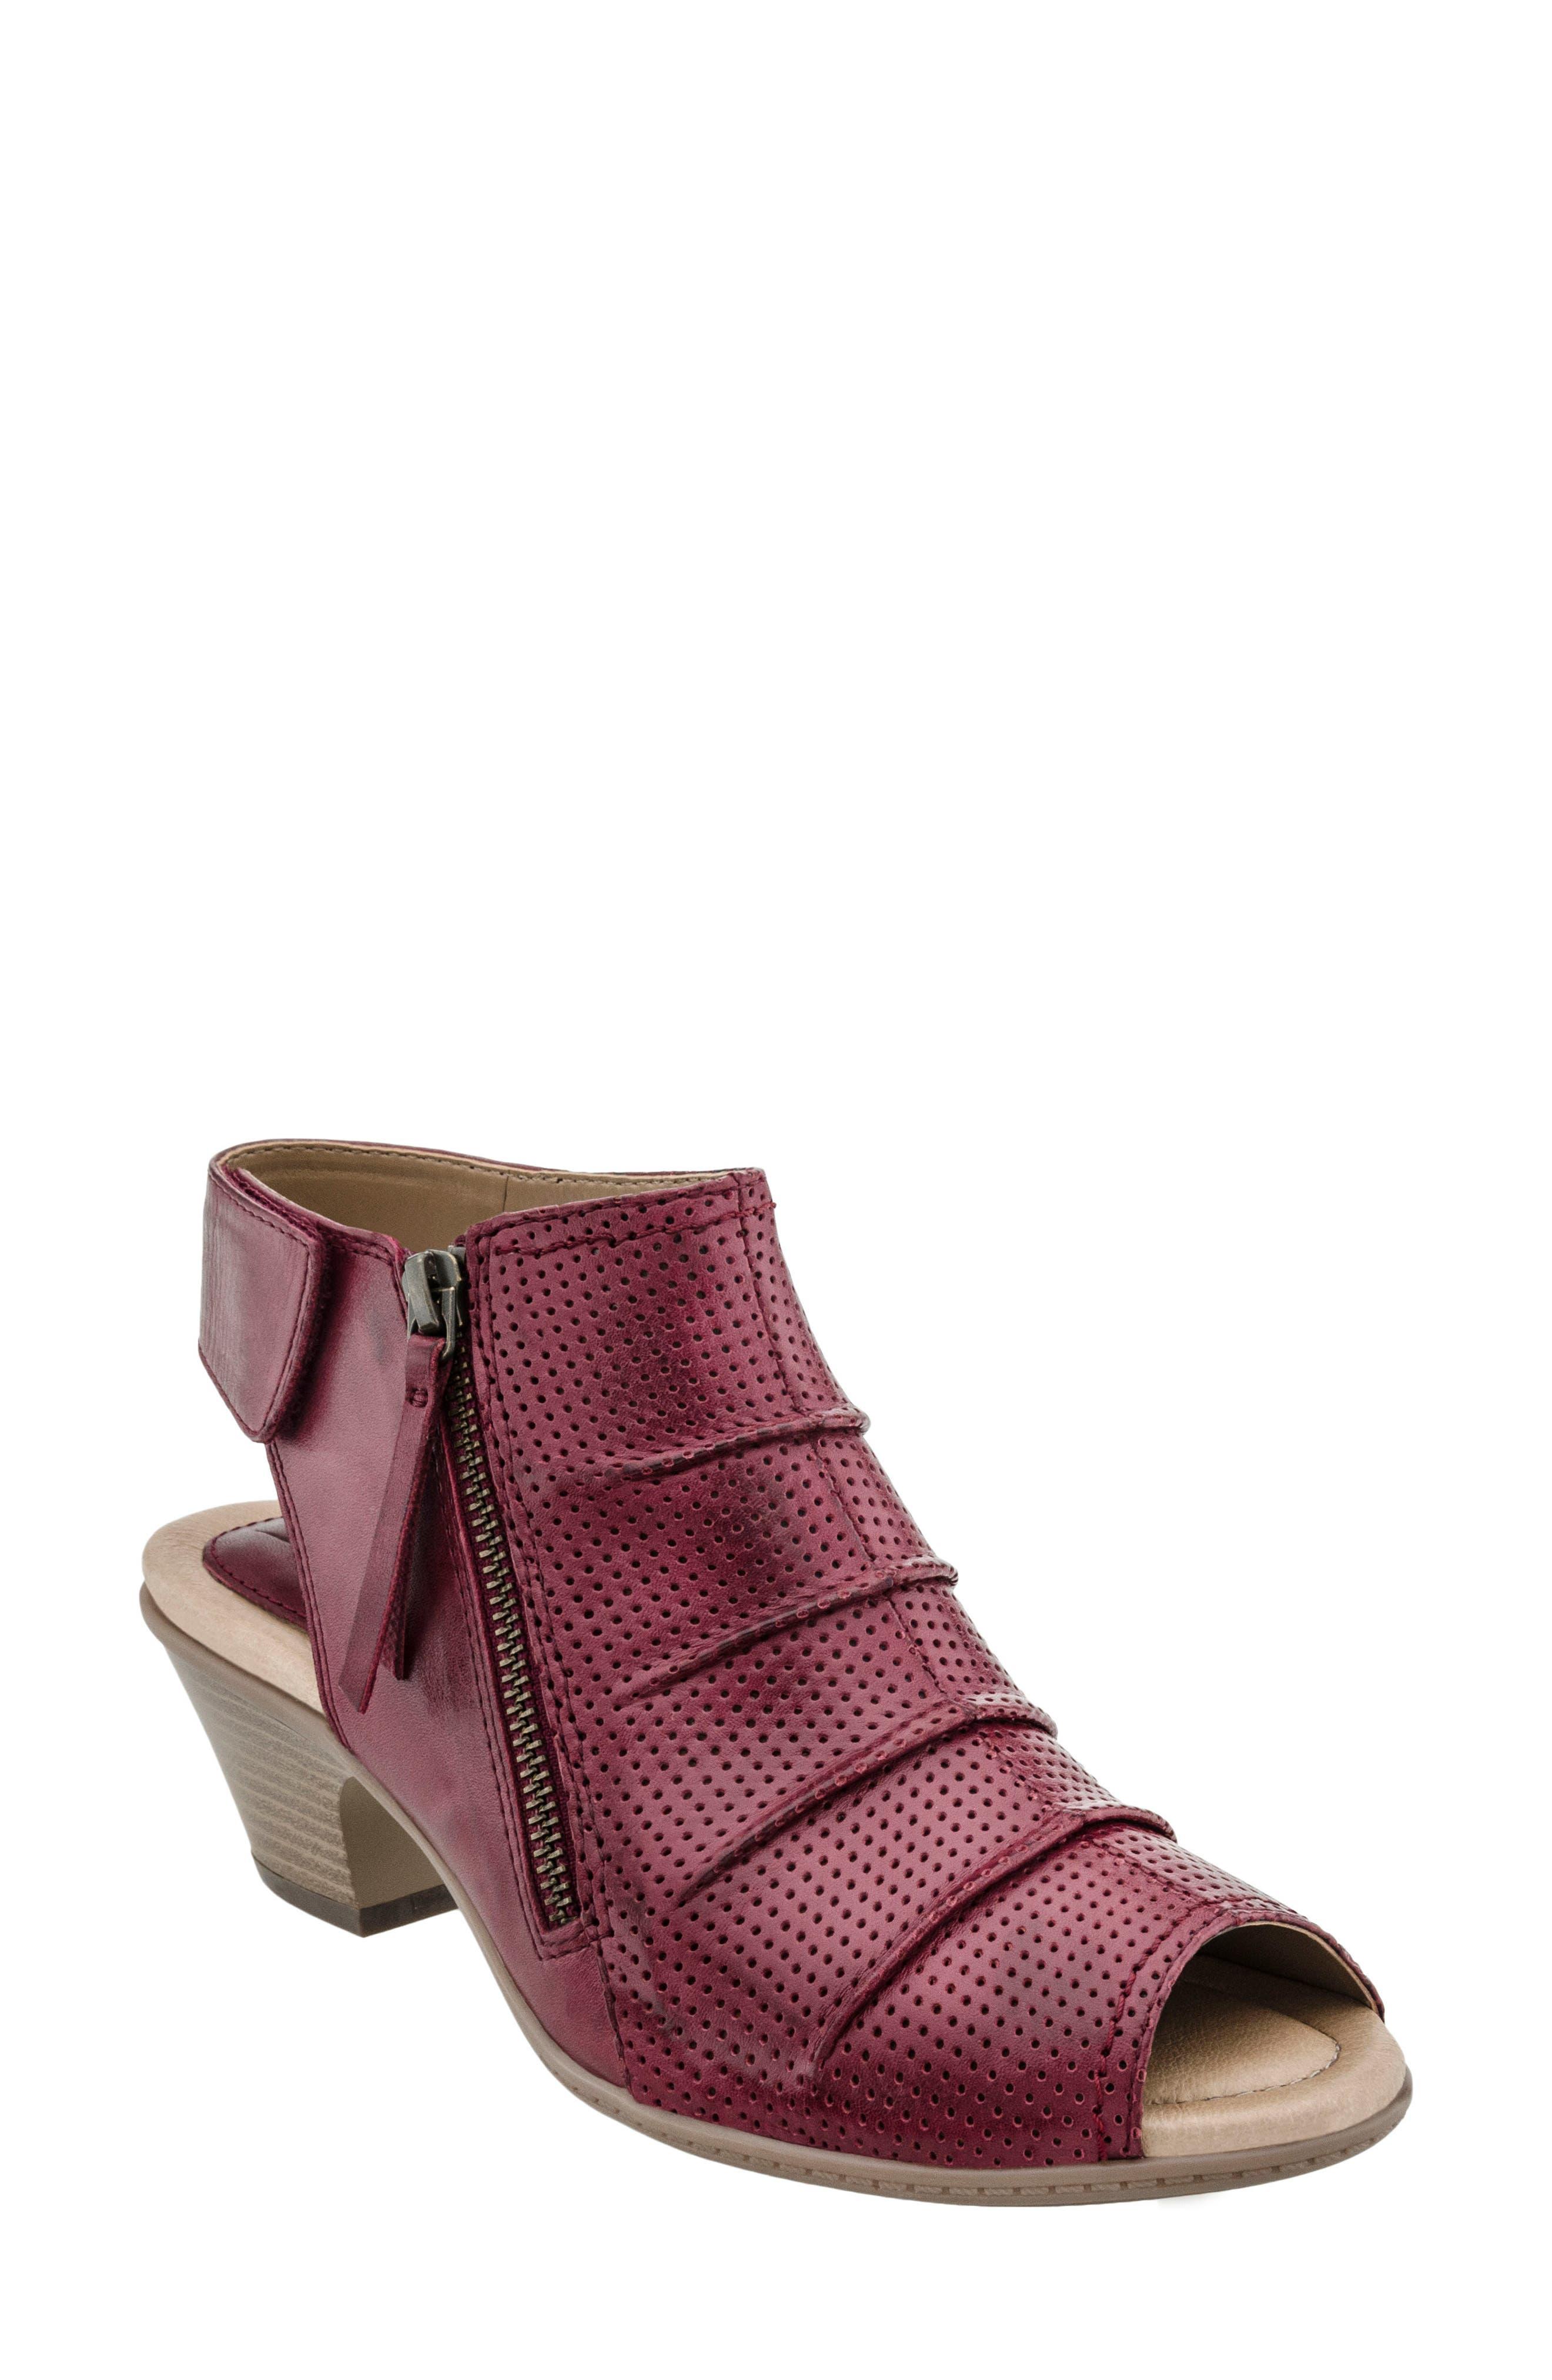 Main Image - Earth® Hydra Sandal (Women)